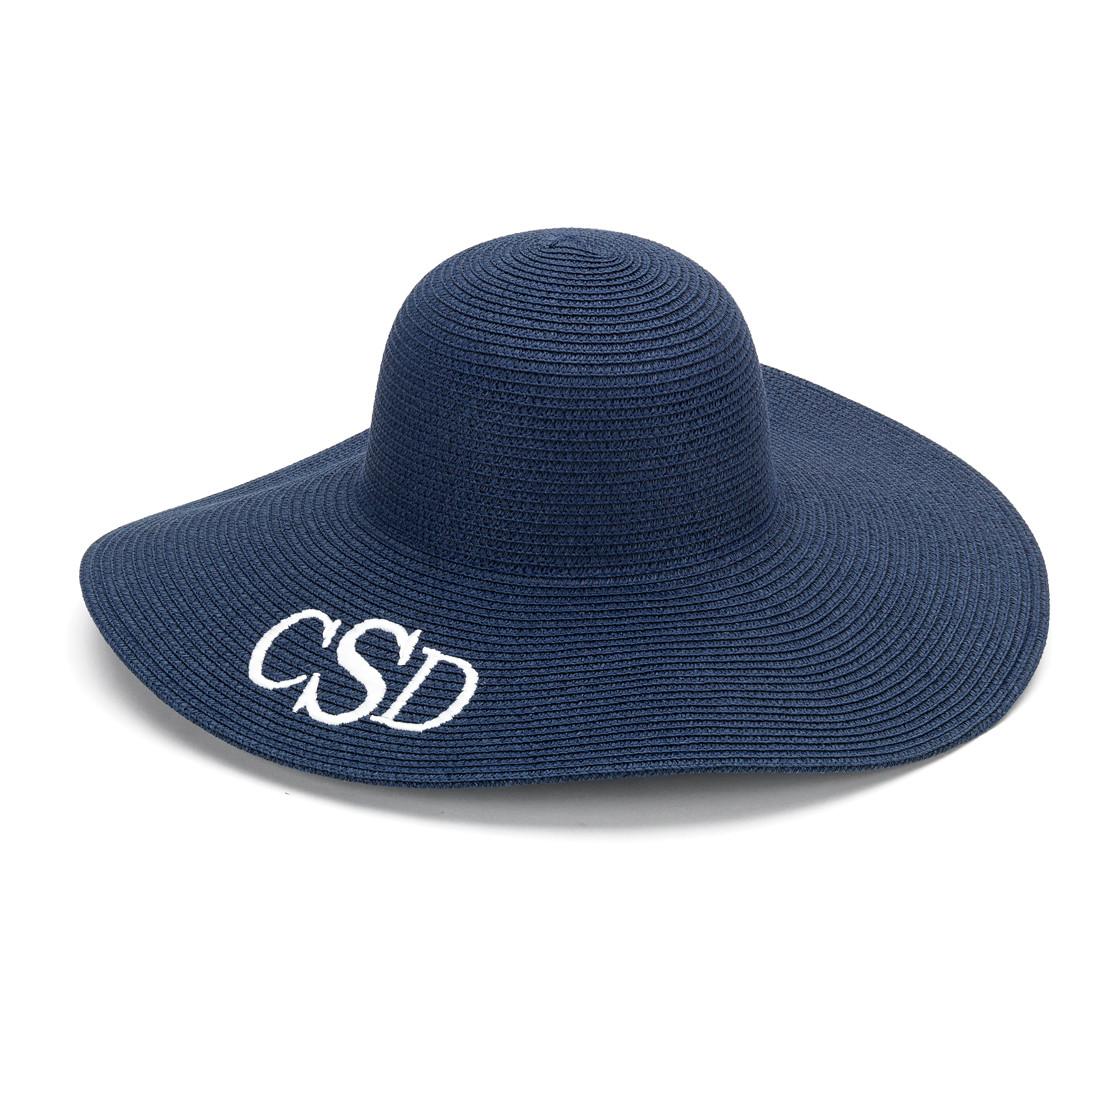 0f5503c1995c7 Monogrammed Coral Adult Sun Floppy Hat